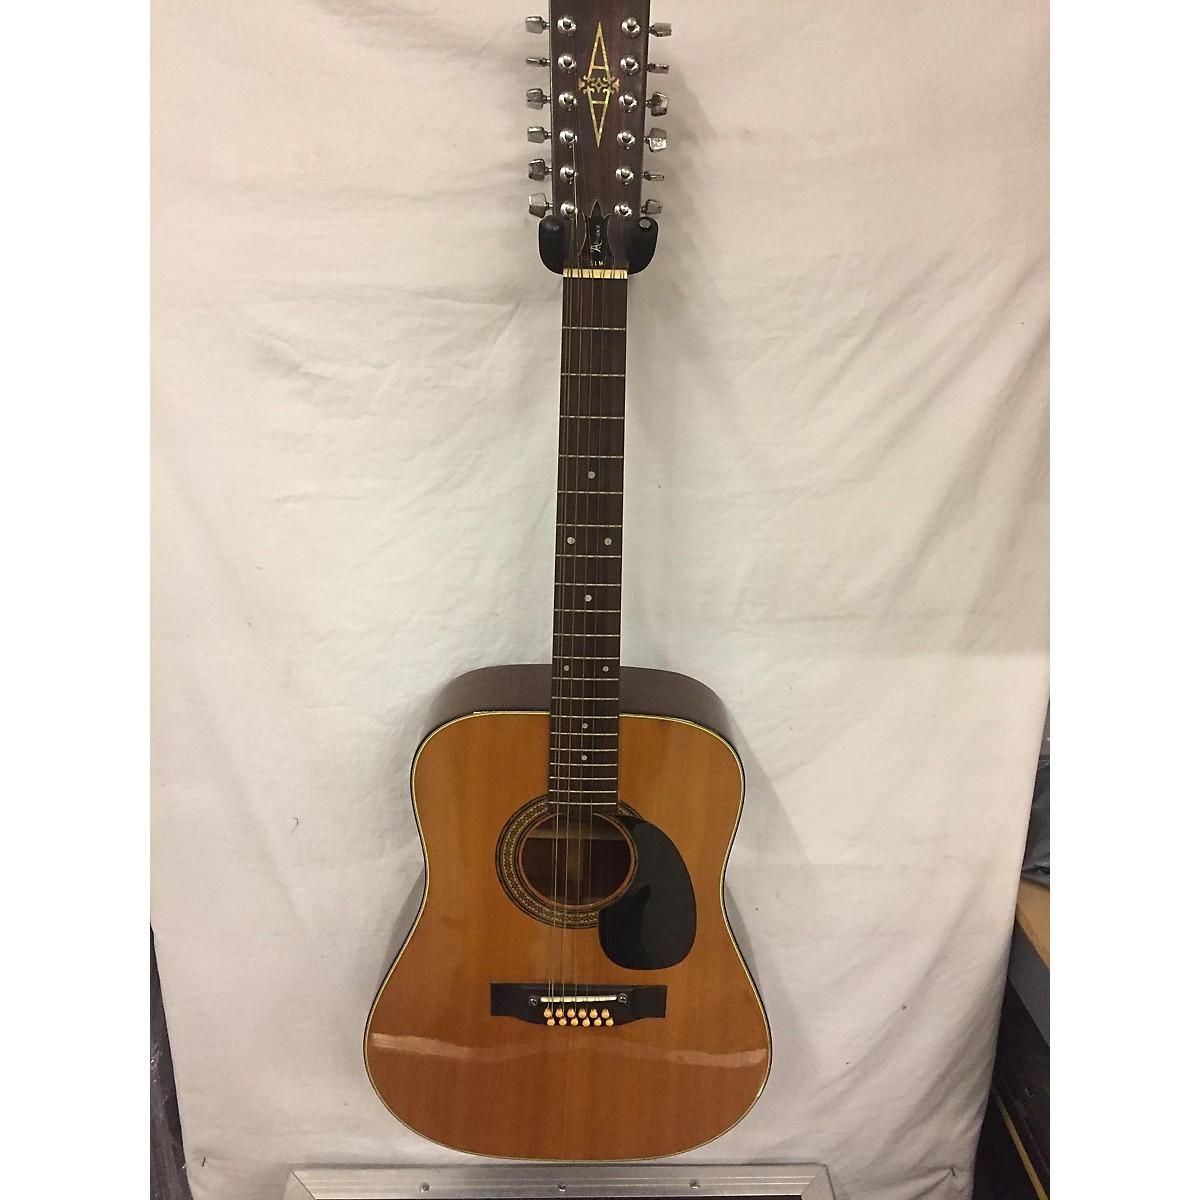 Alvarez 1970s 5021 12 String Acoustic Guitar